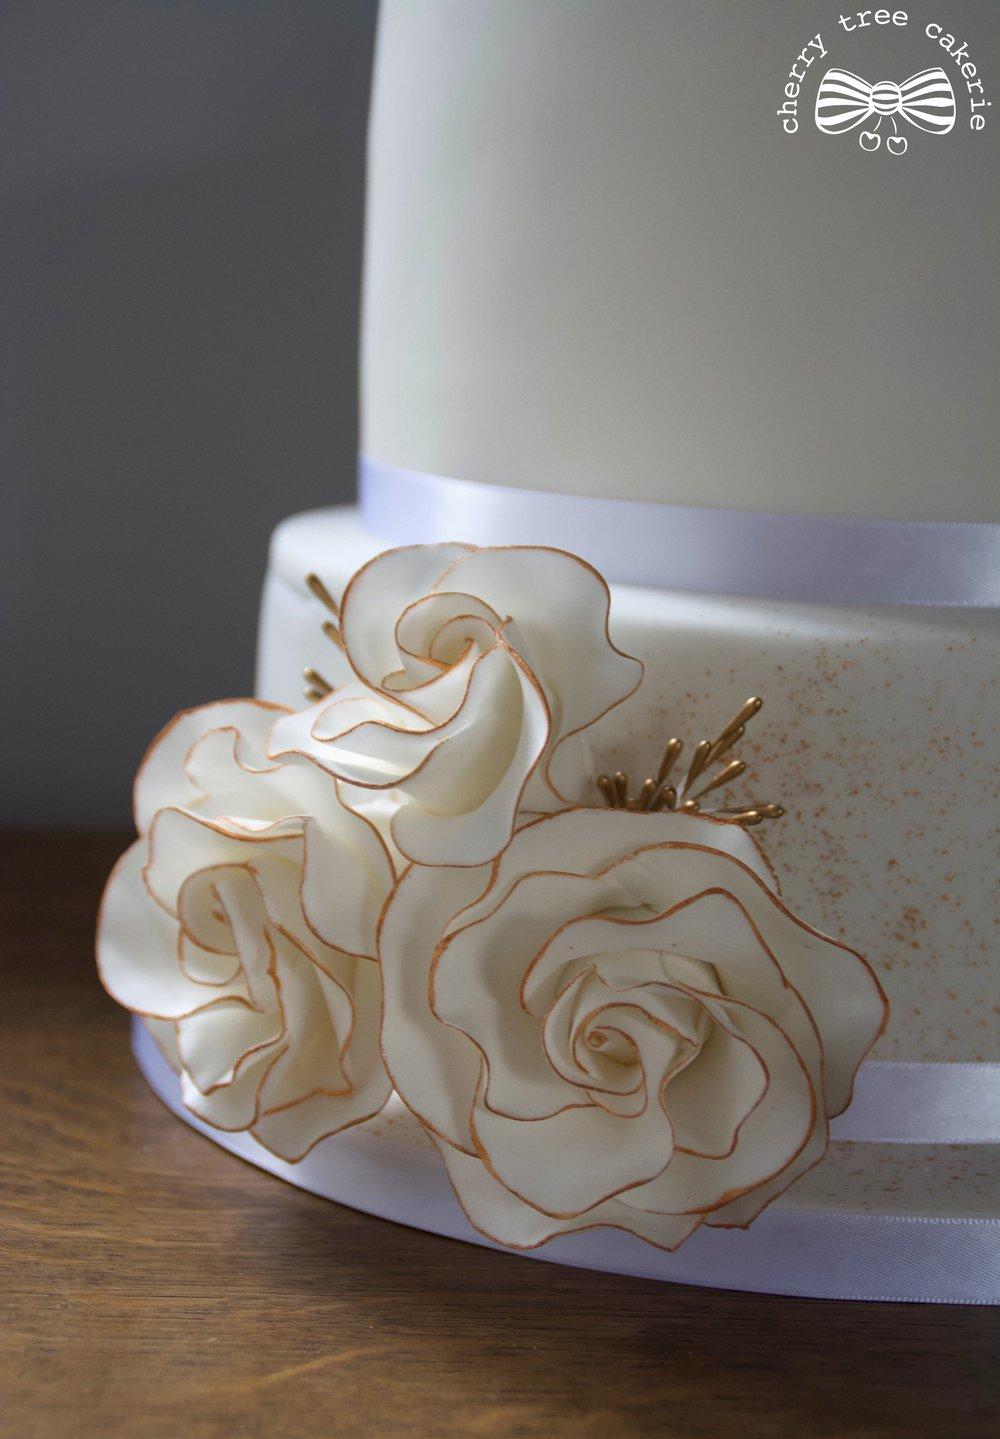 Gold_and_white_rose_wedding_cake_bottom_view.jpg